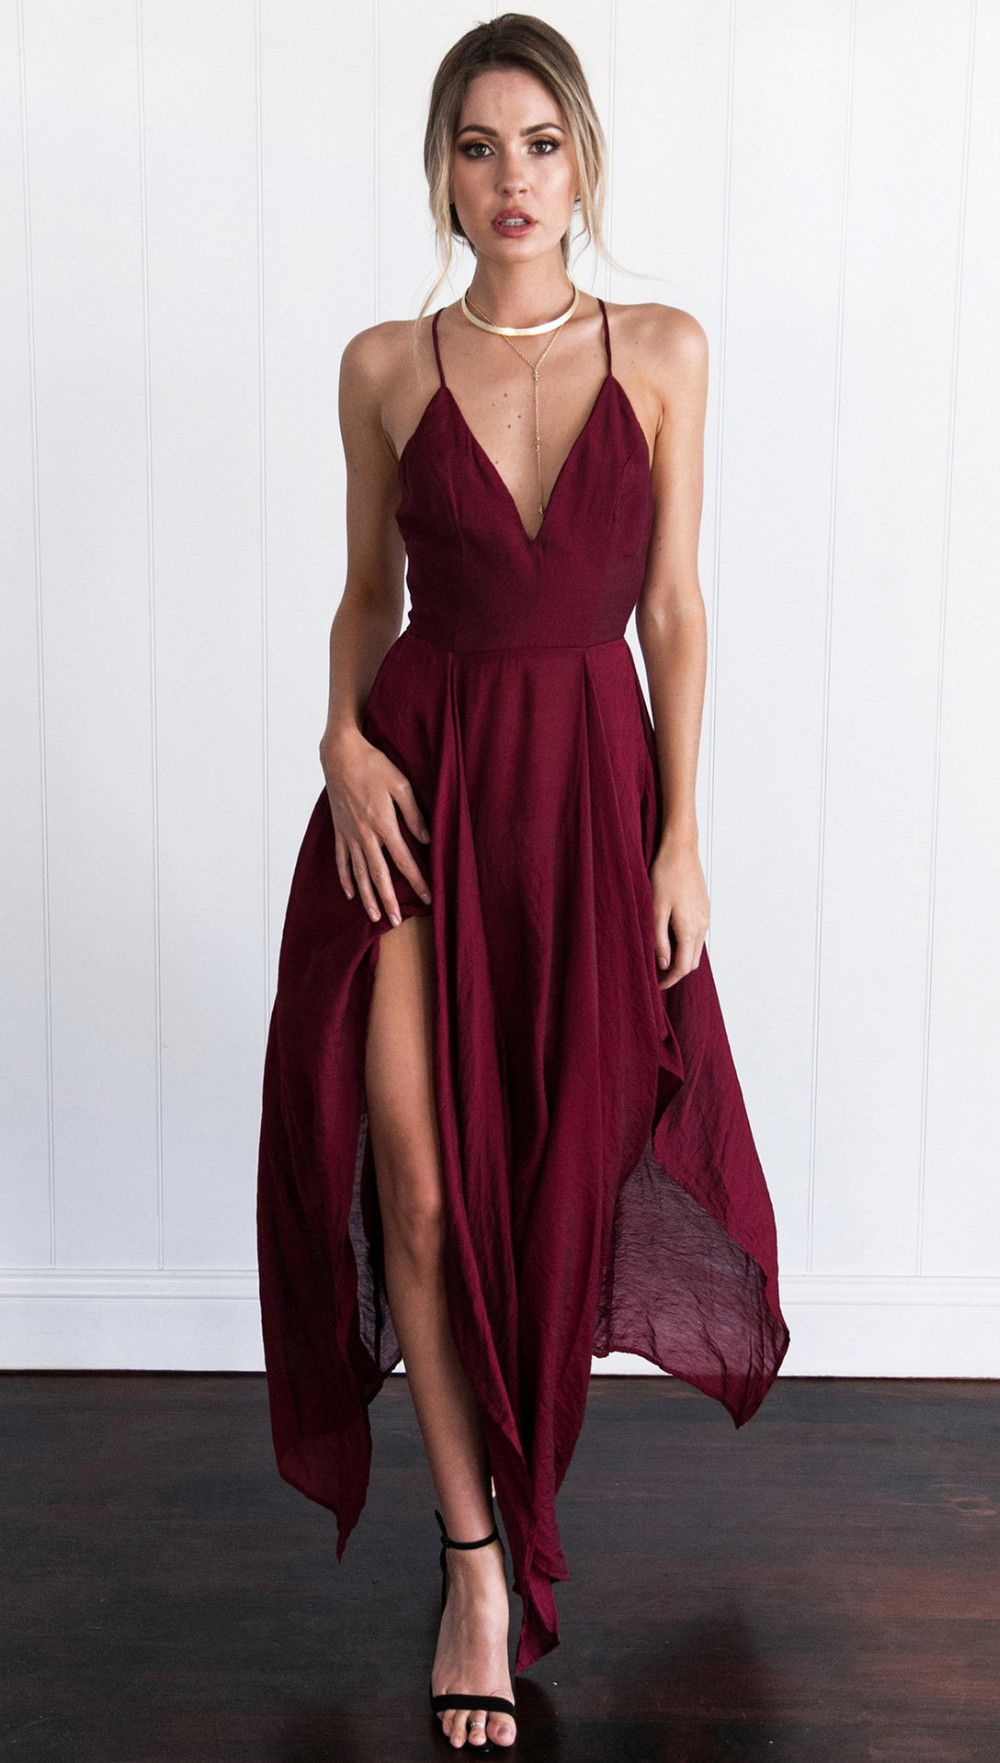 New Arrival Cross Back Wine Red Assymetrical hem Long Prom/Evening Dress